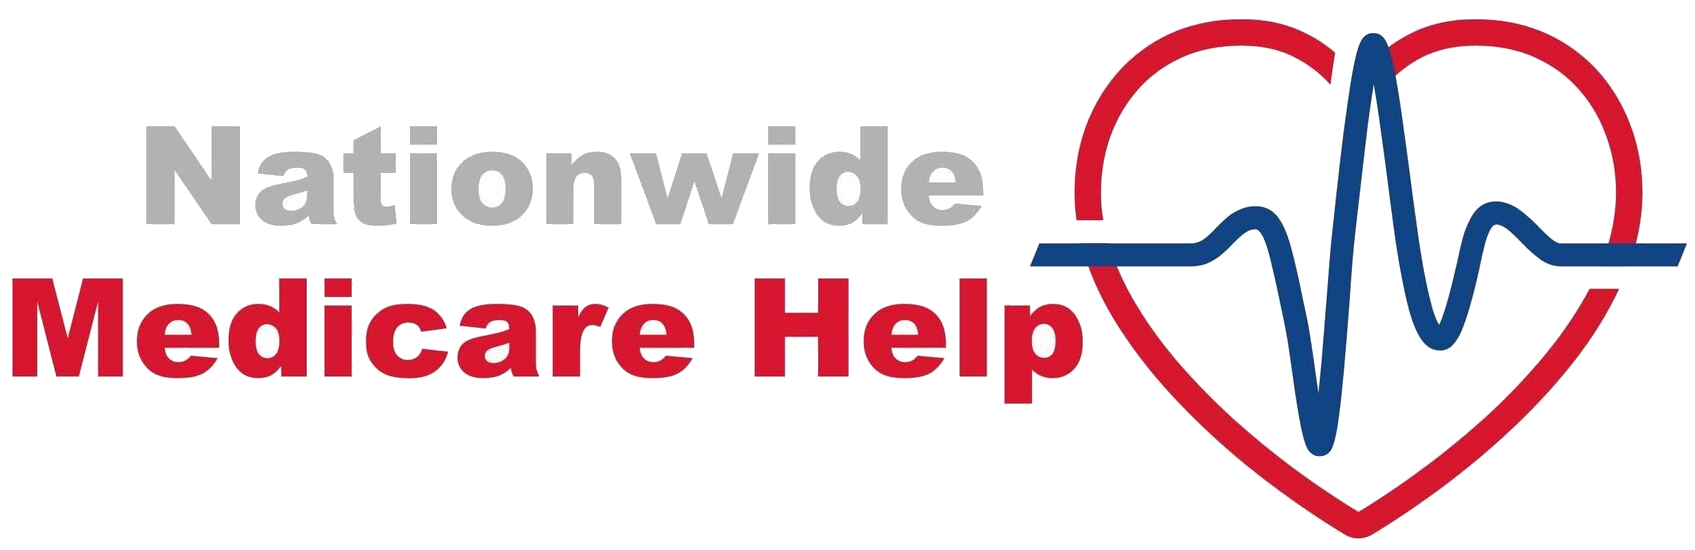 Nationwide Medicare Help